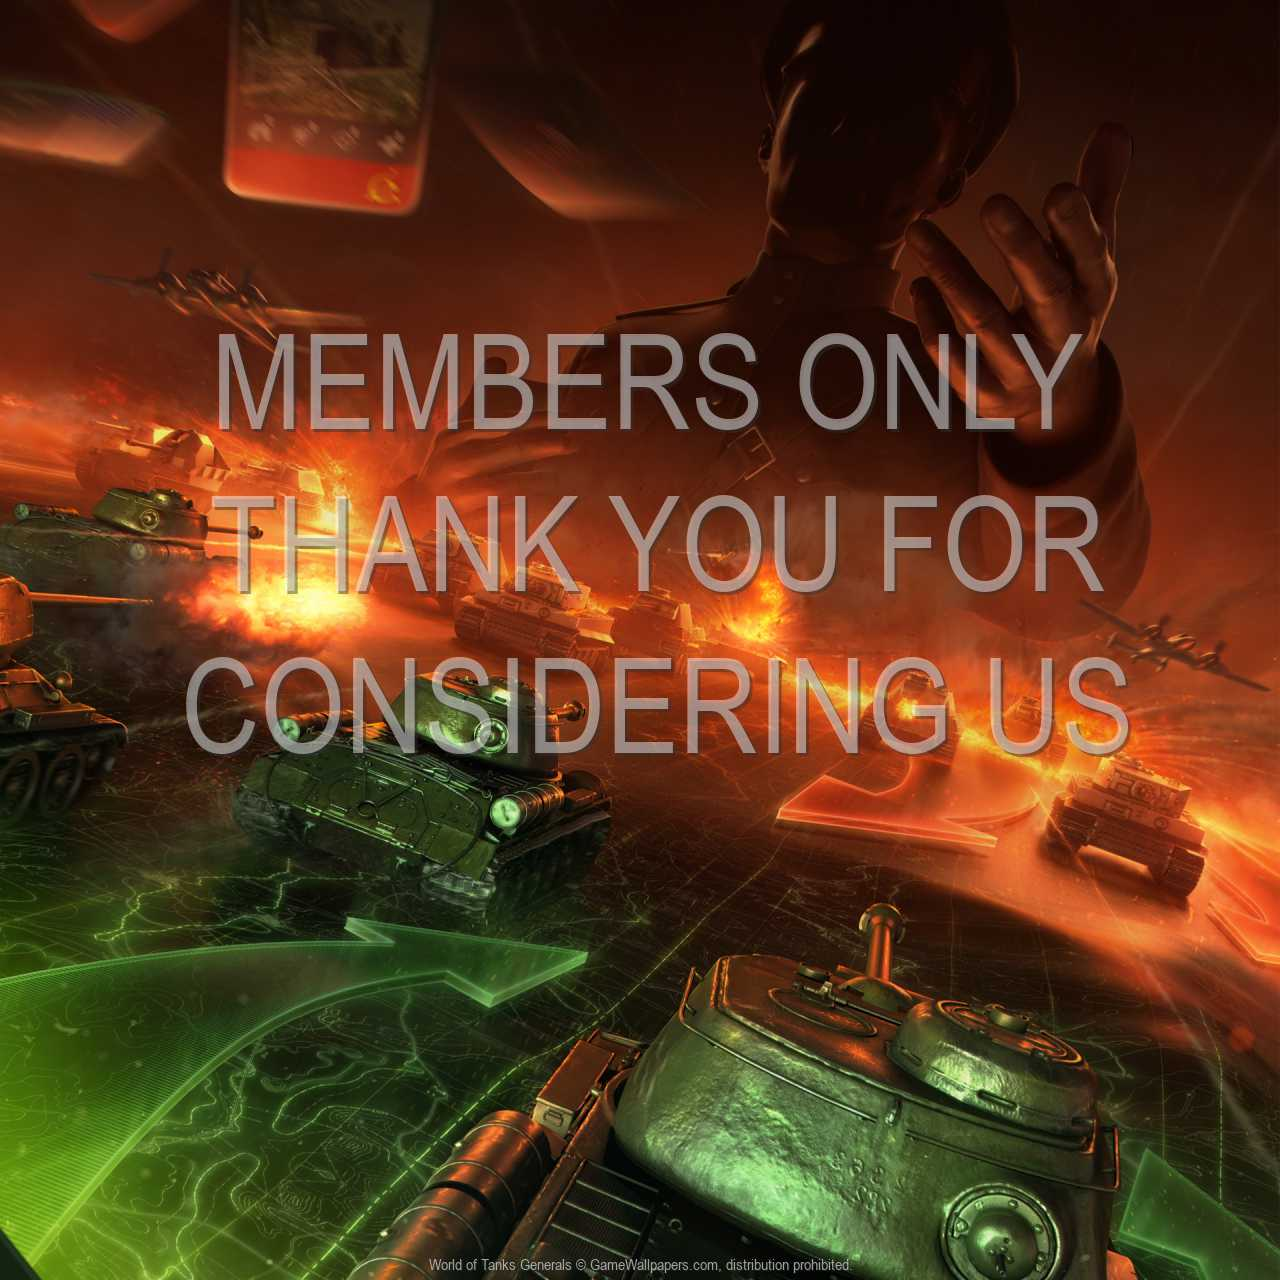 World of Tanks: Generals 720p Horizontal Handy Hintergrundbild 01